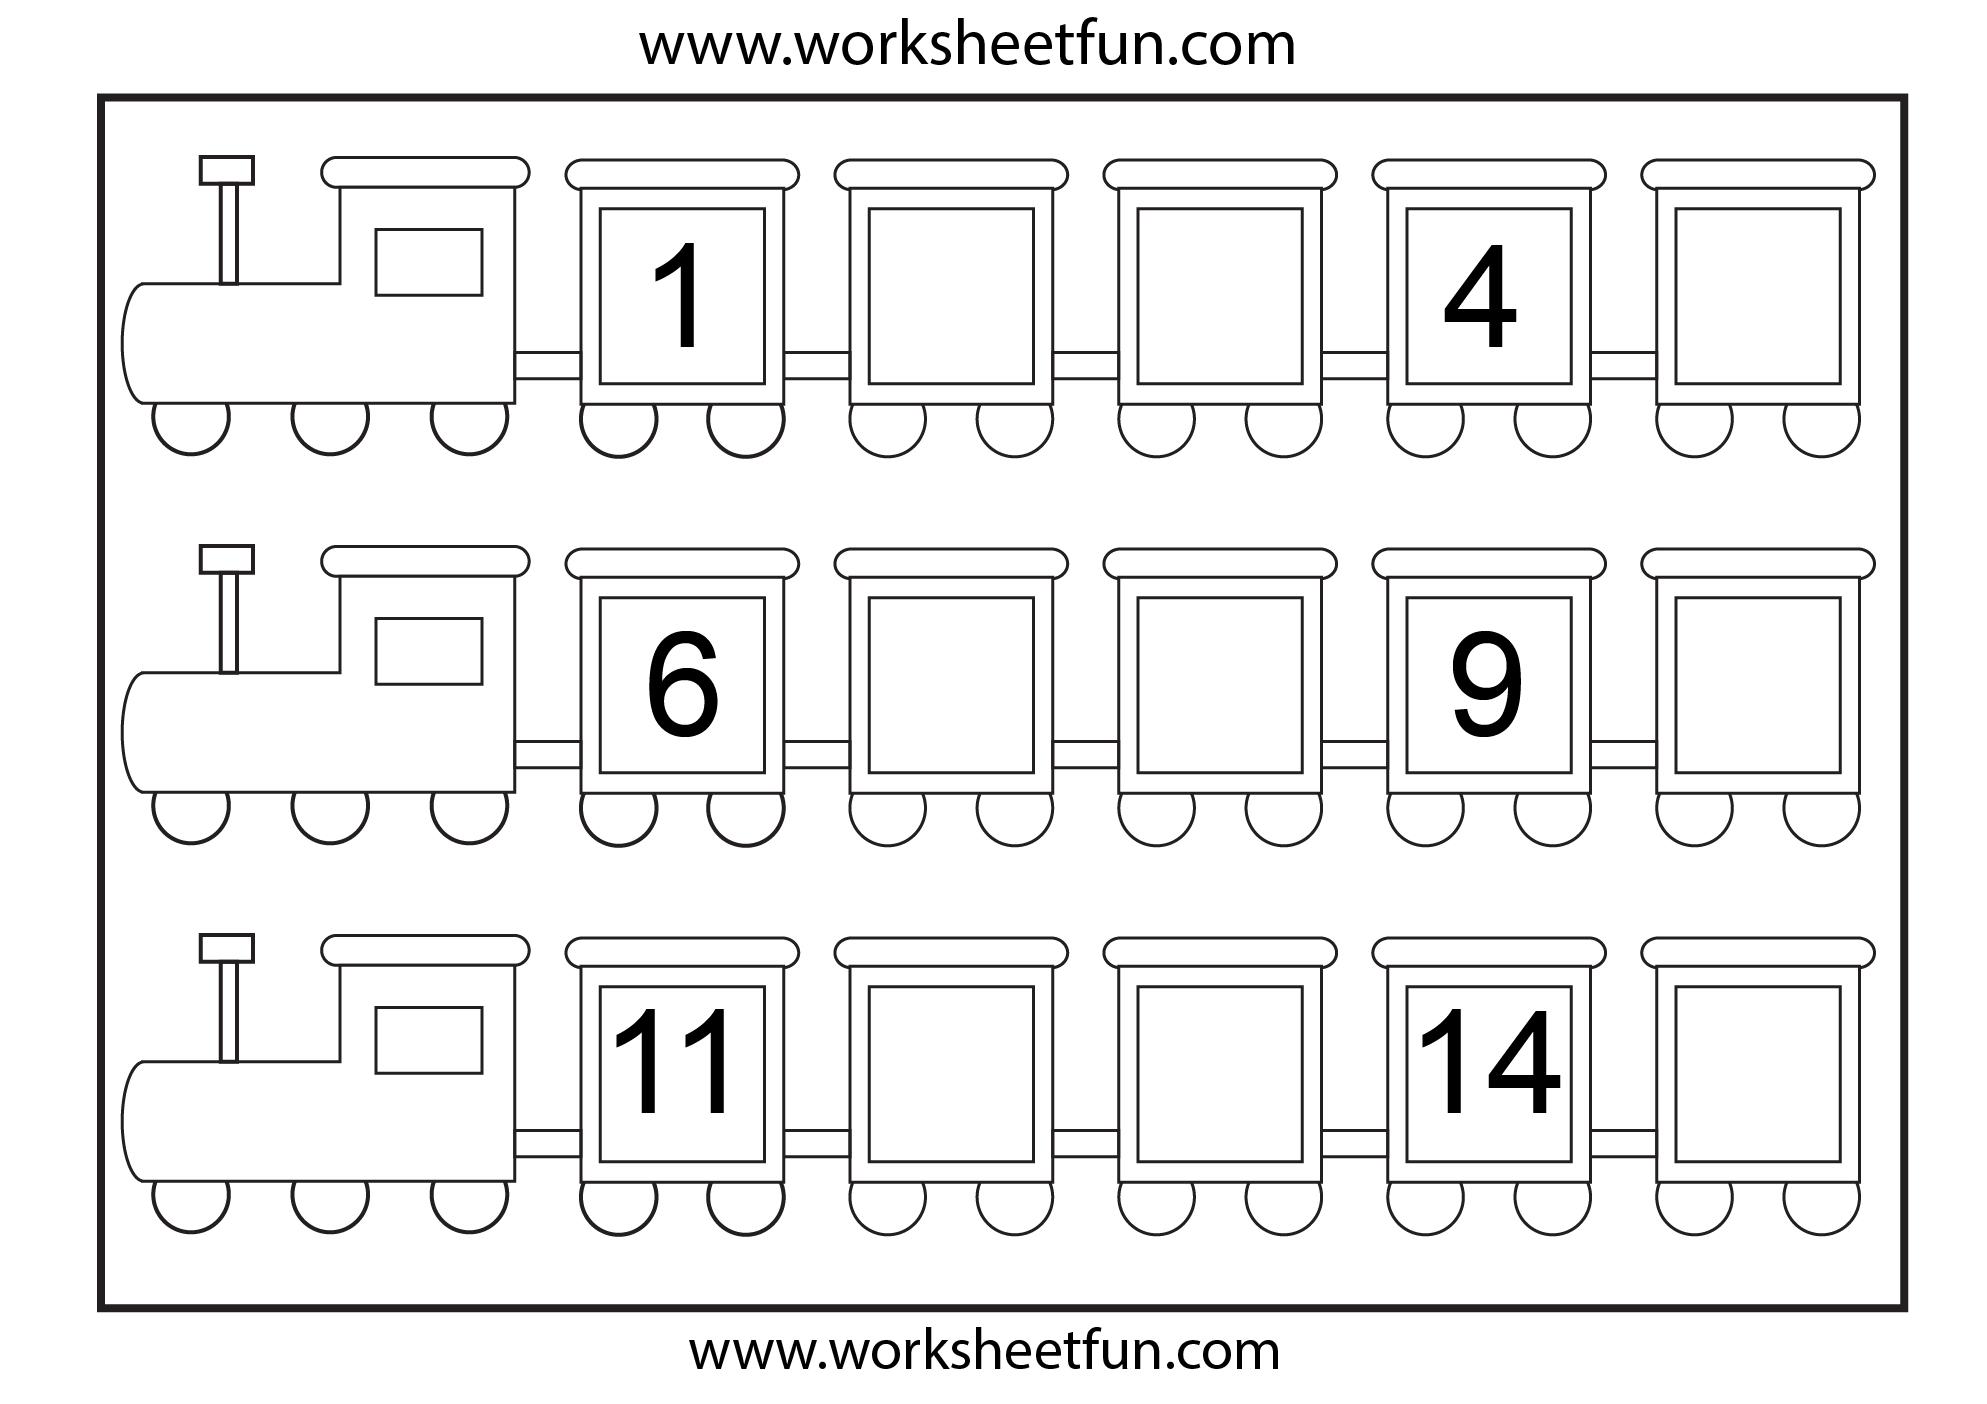 Preschool Missing Number Worksheets | Number Train – Missing Numbers | Free Printable Missing Number Worksheets